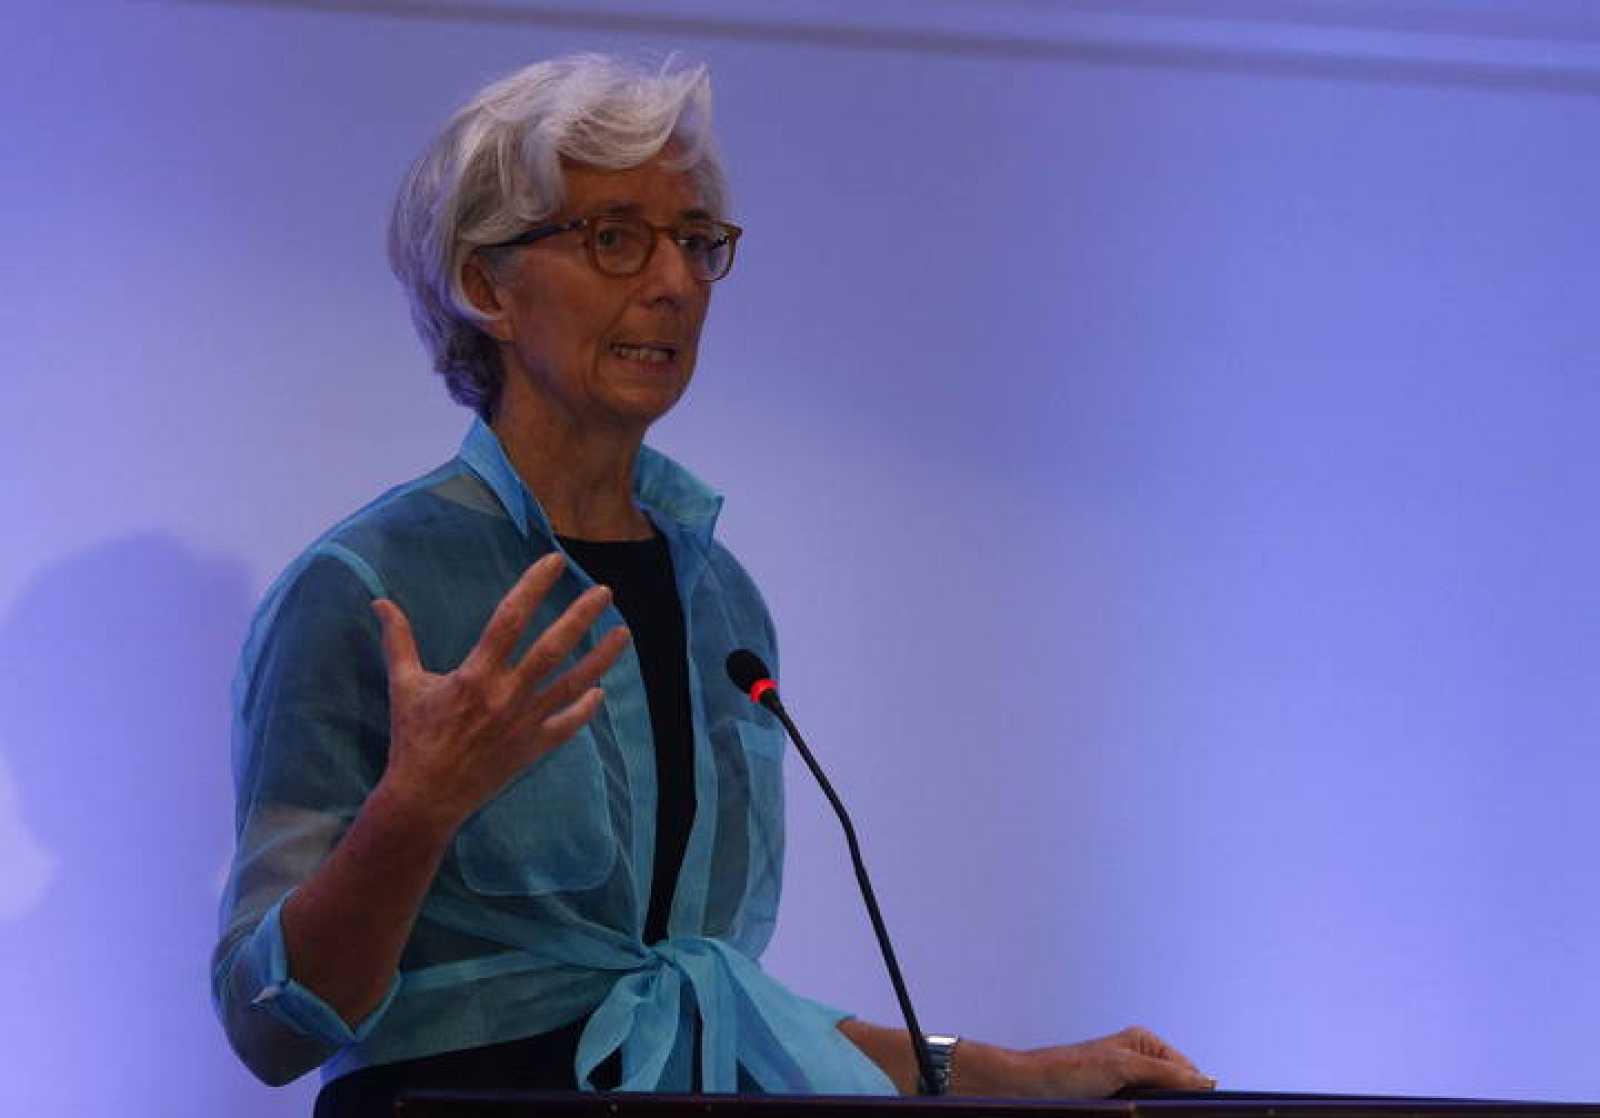 La directora general del Fondo Monetario Internacional (FMI), Christine Lagarde